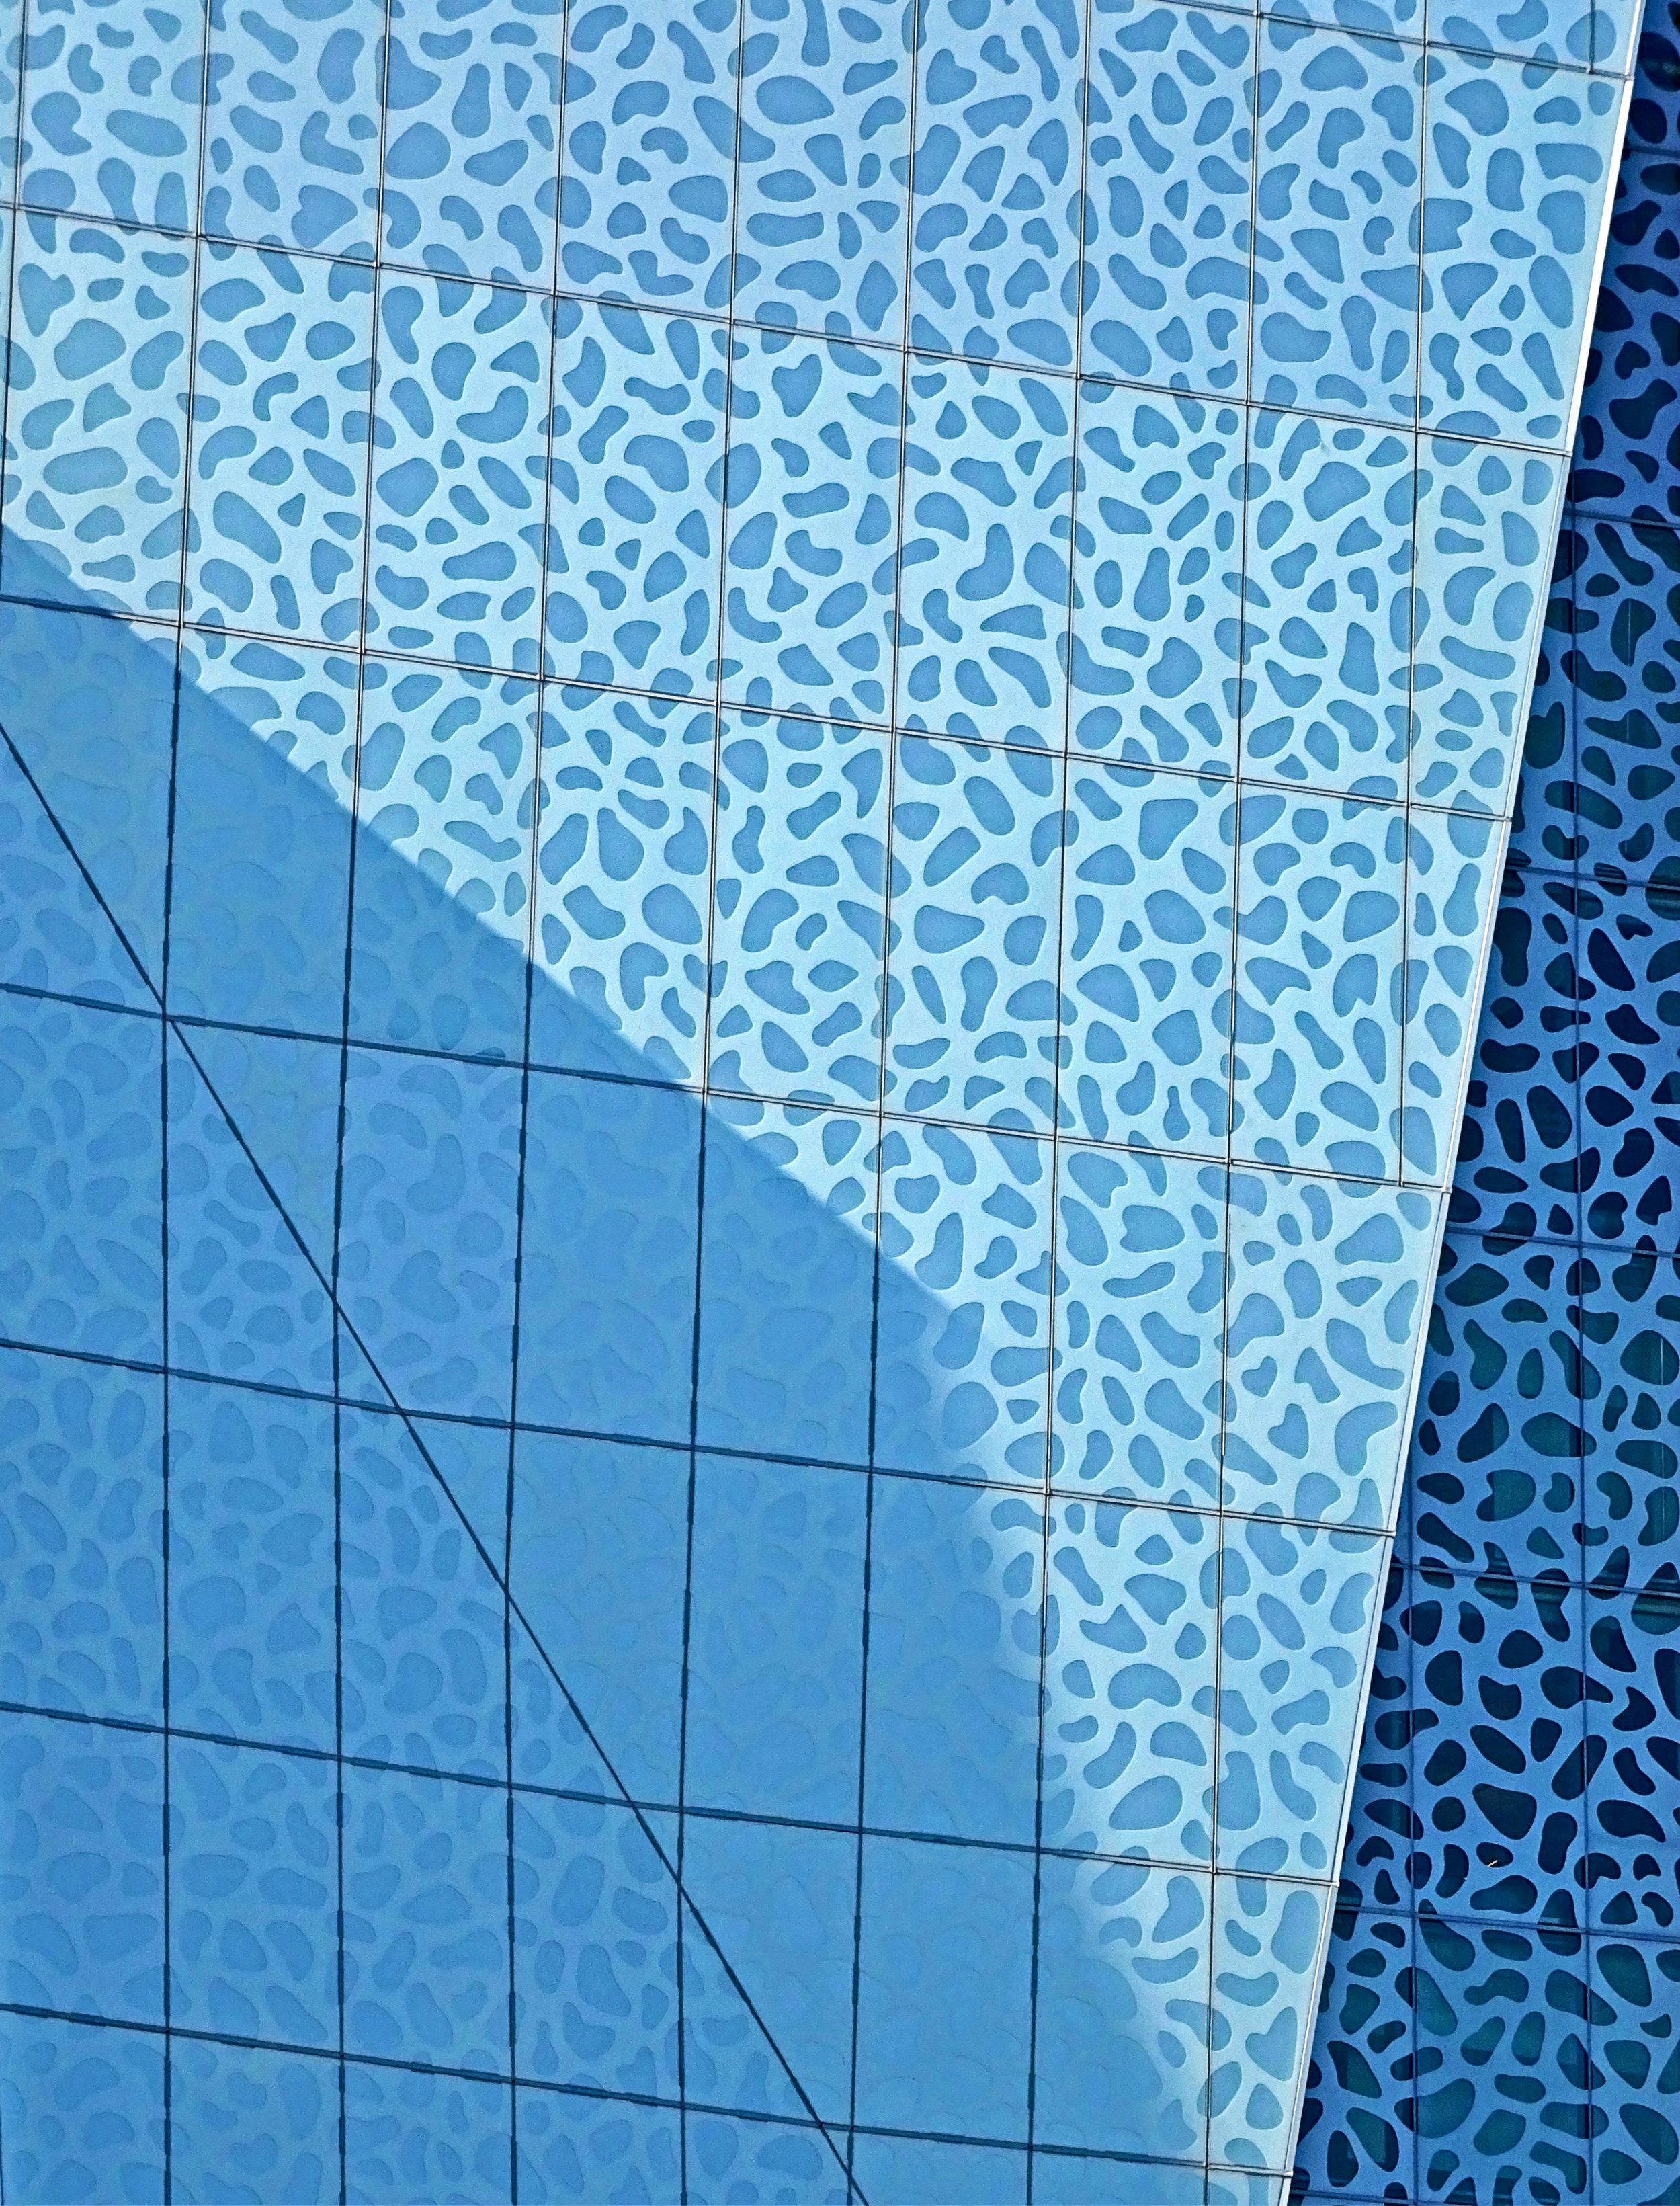 Shades of Blue 2 - final version.jpg